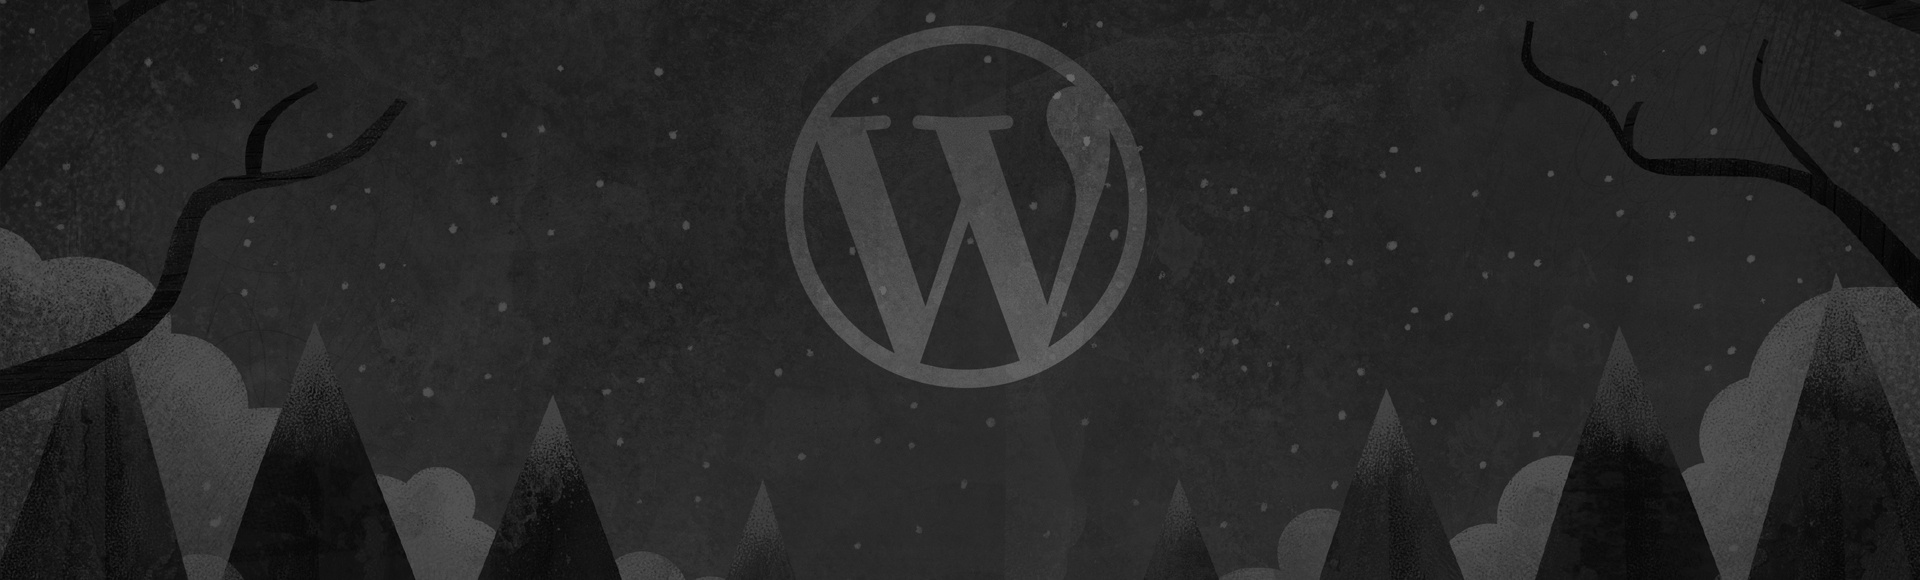 wordpress-website-design-and-development-banner